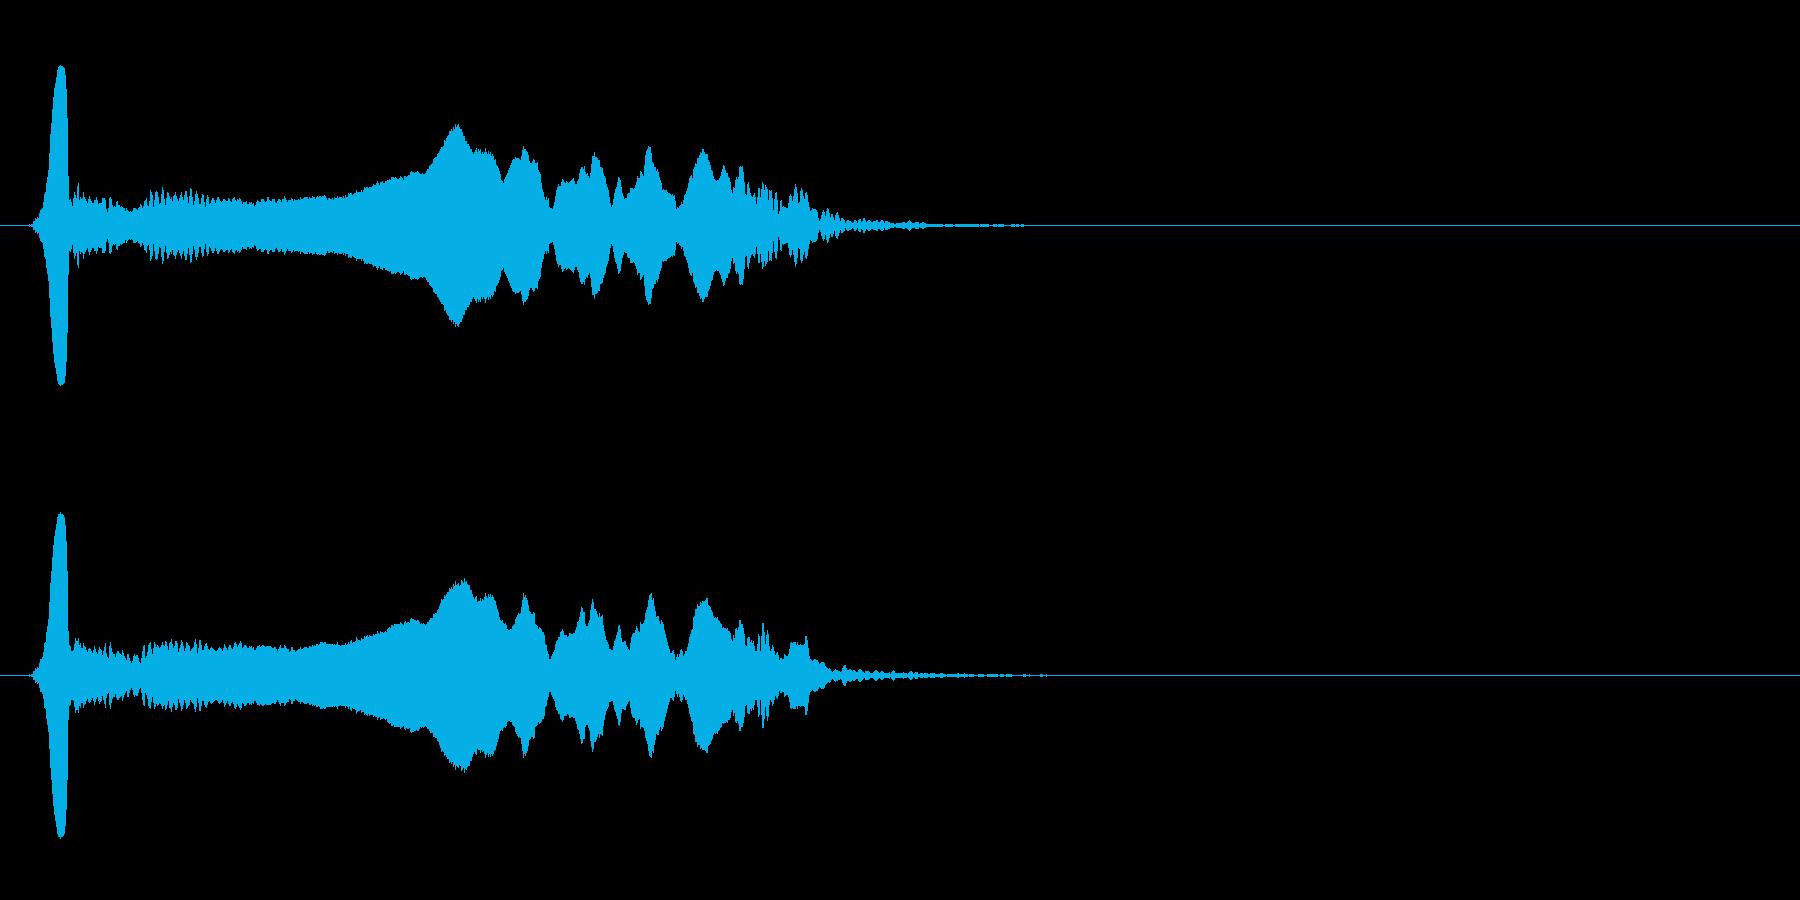 尺八 生演奏 古典風 残響音有 #19の再生済みの波形